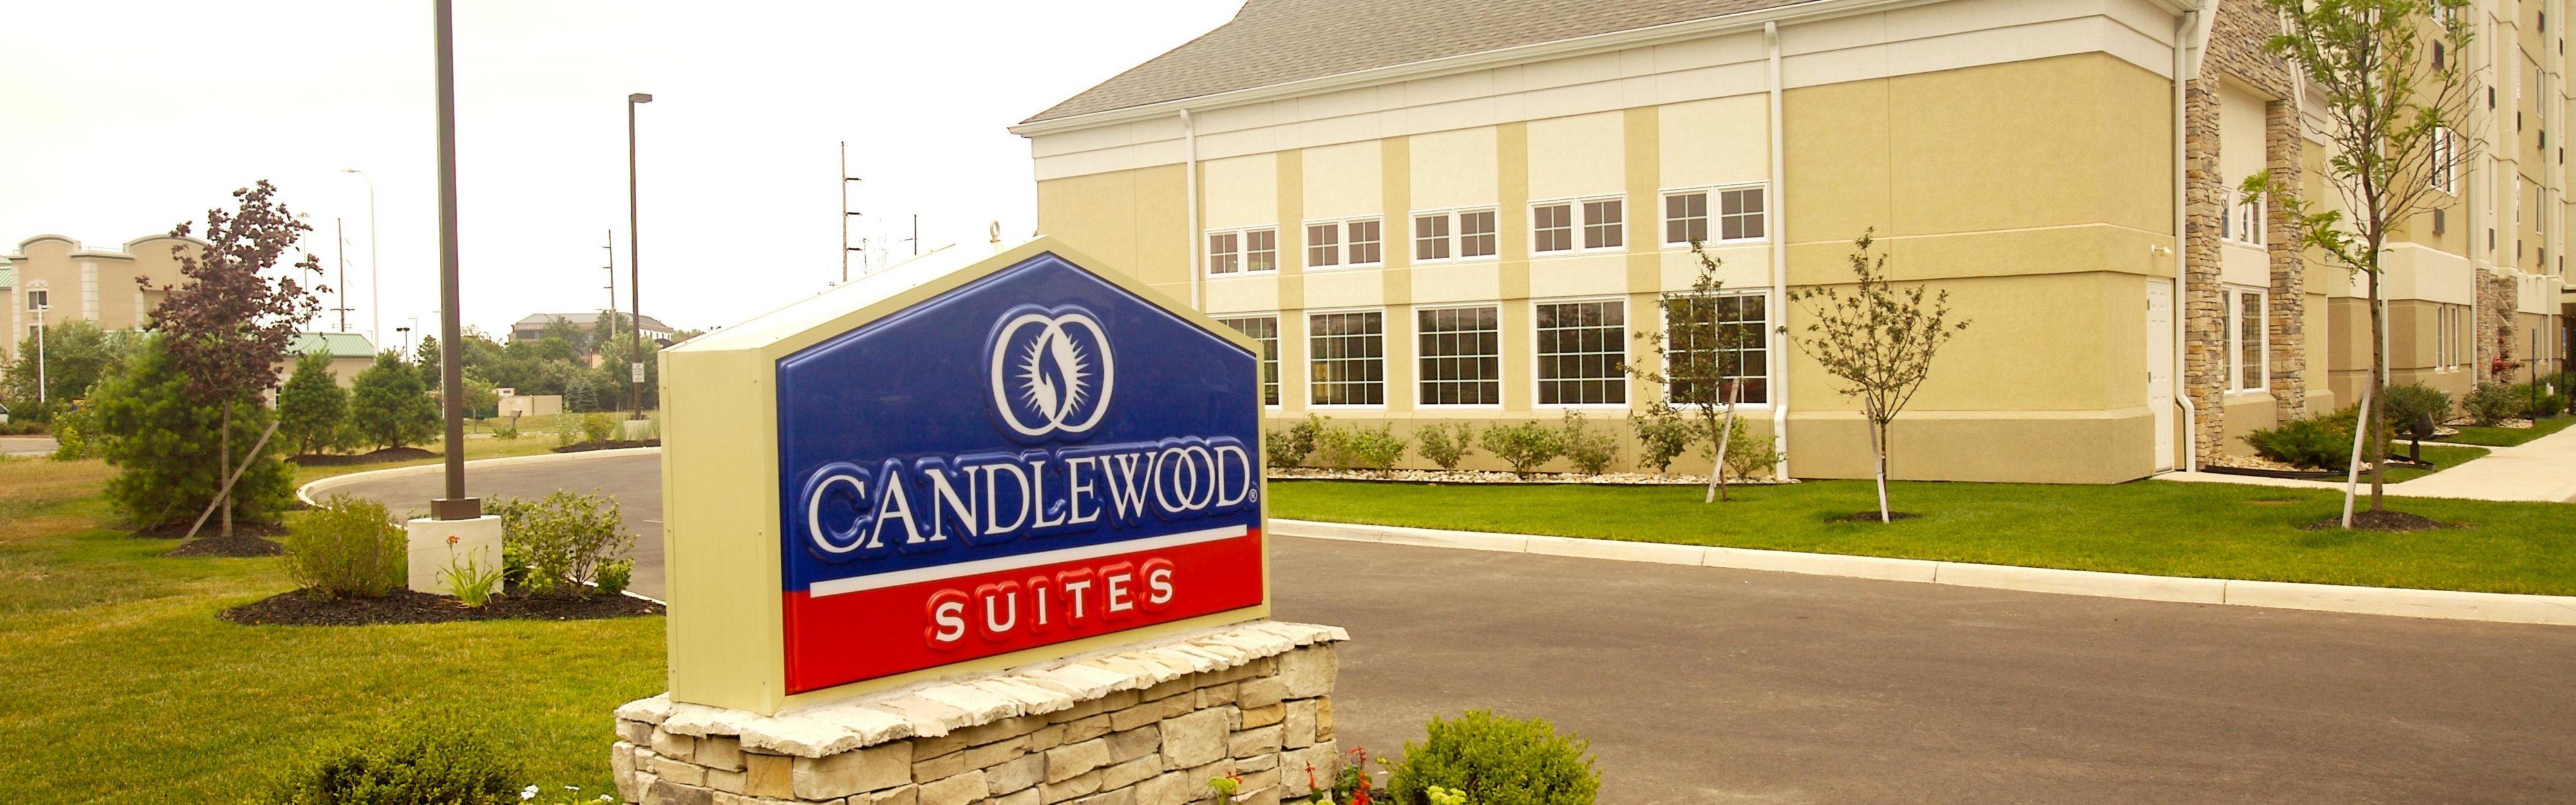 Candlewood Suites Polaris image 0